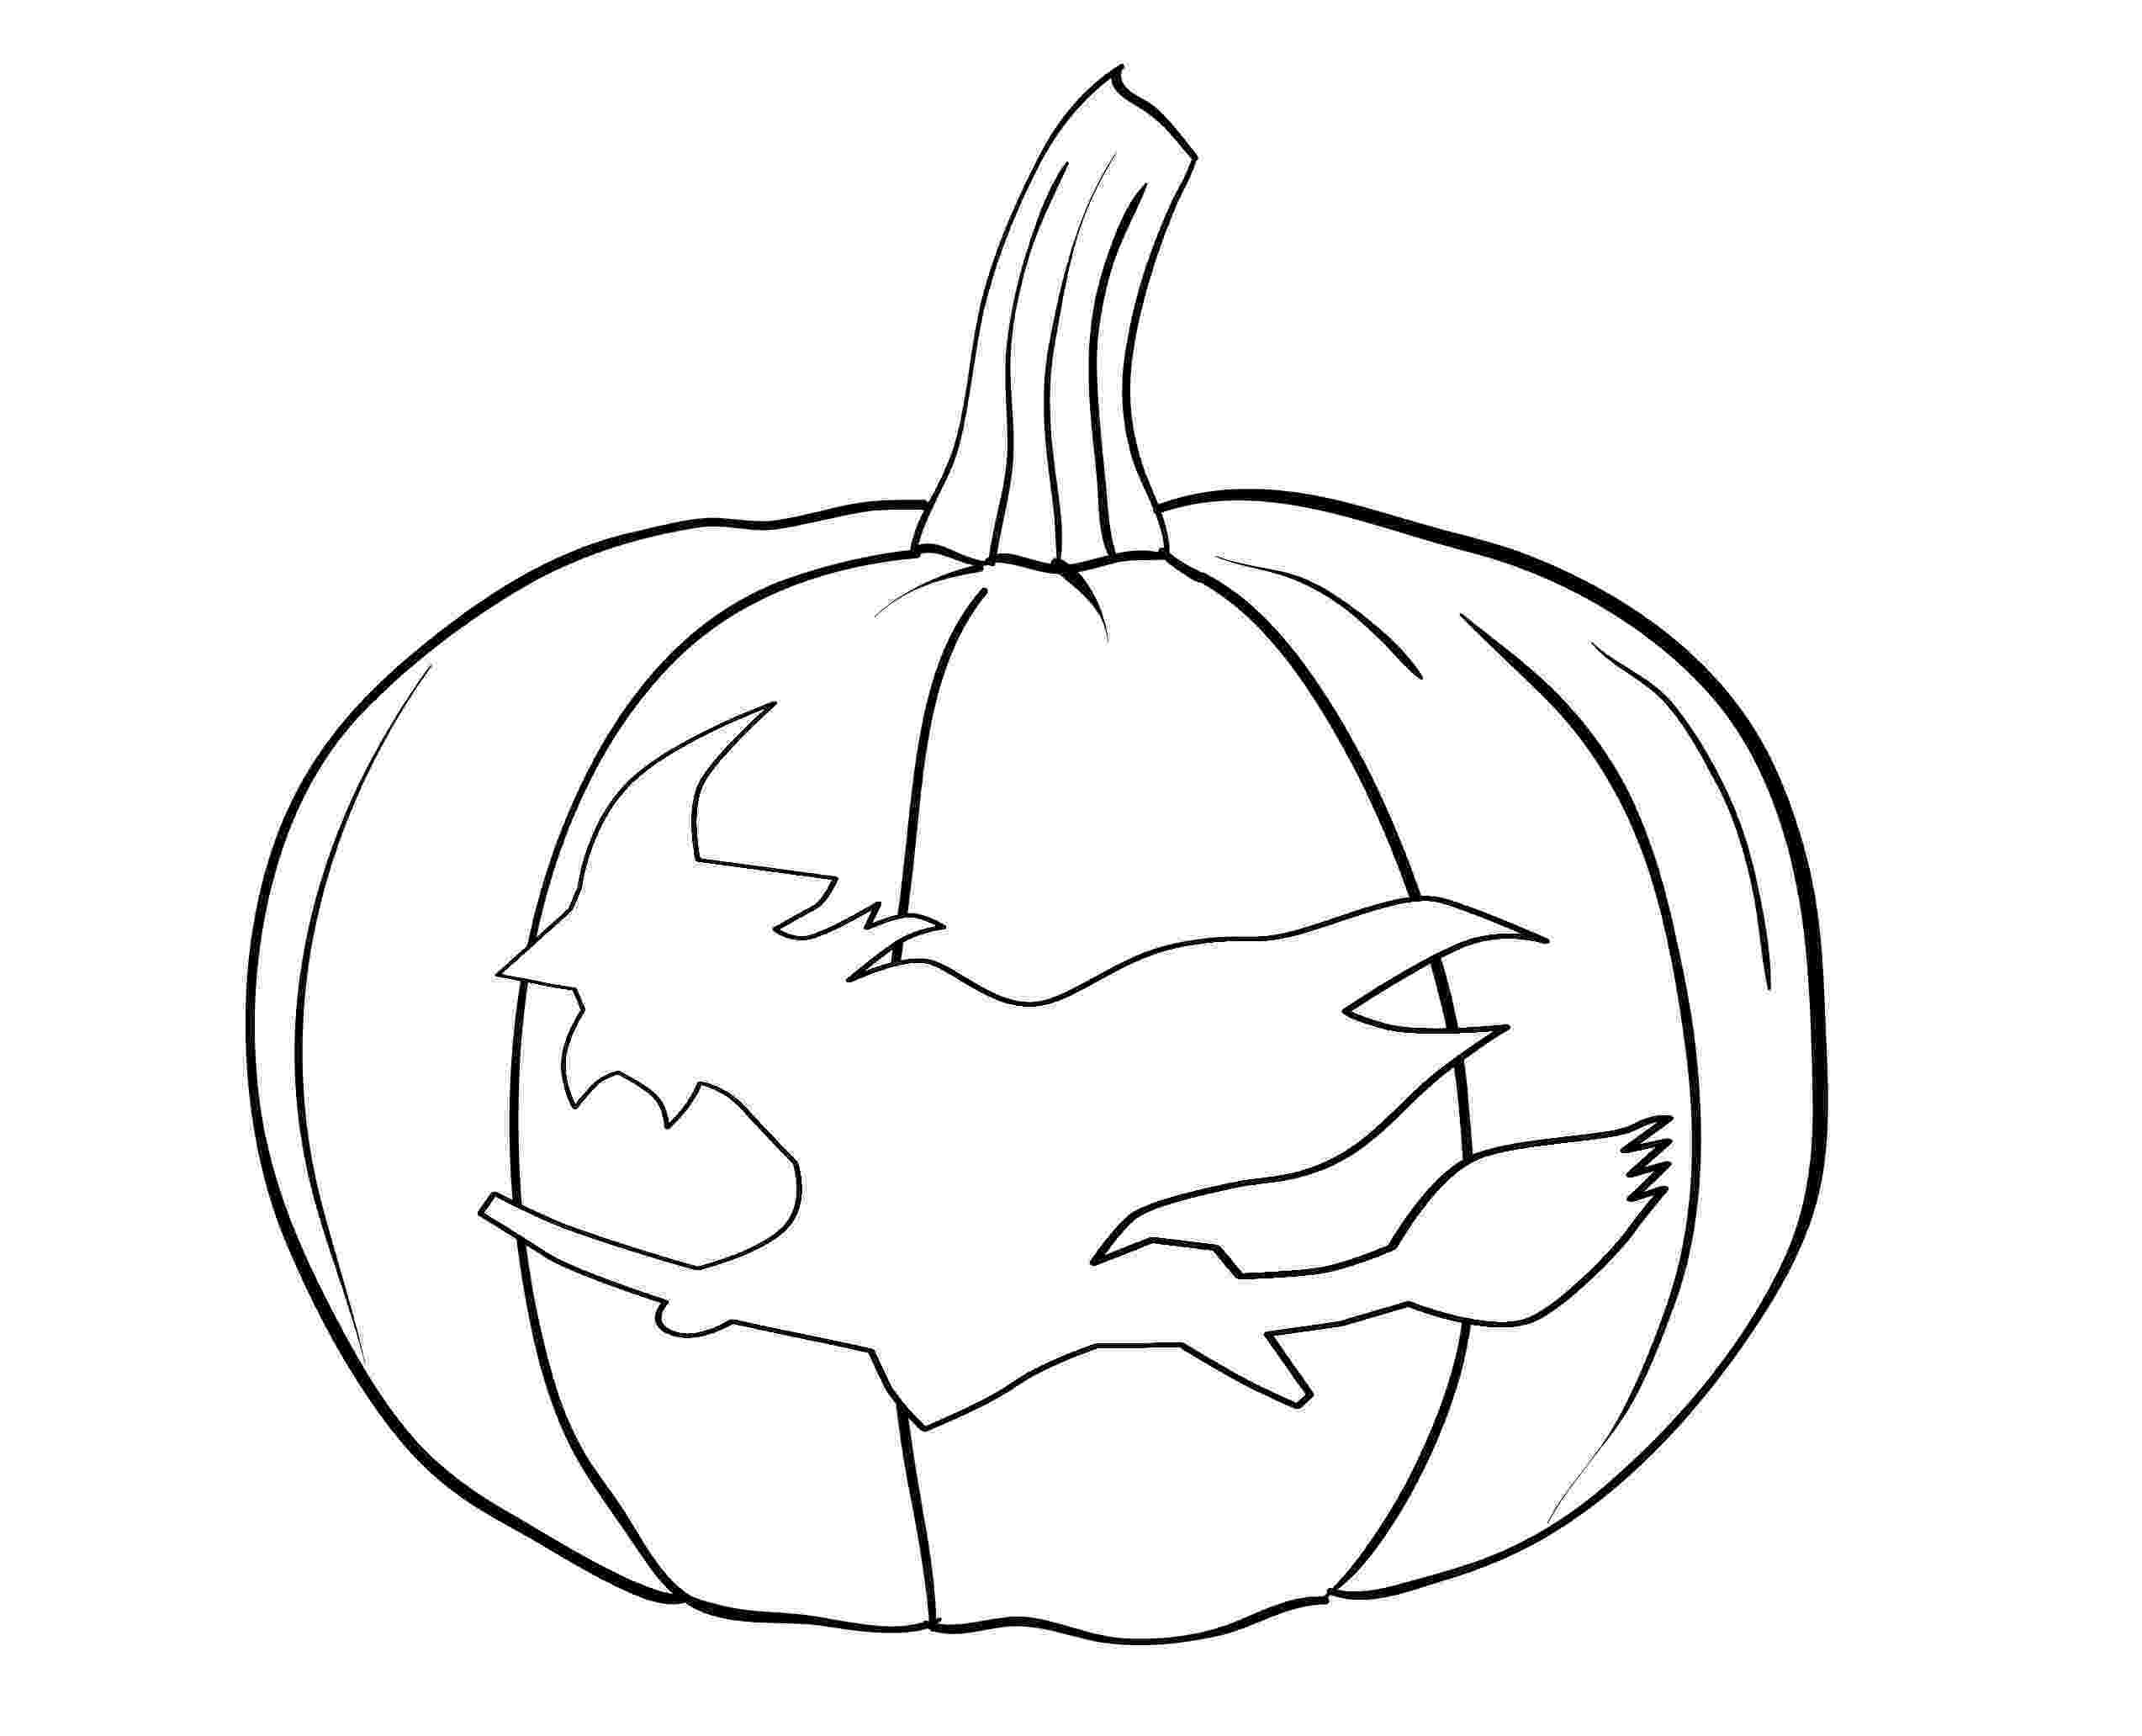 coloring pumpkin simple pumpkin coloring page free printable coloring pages coloring pumpkin